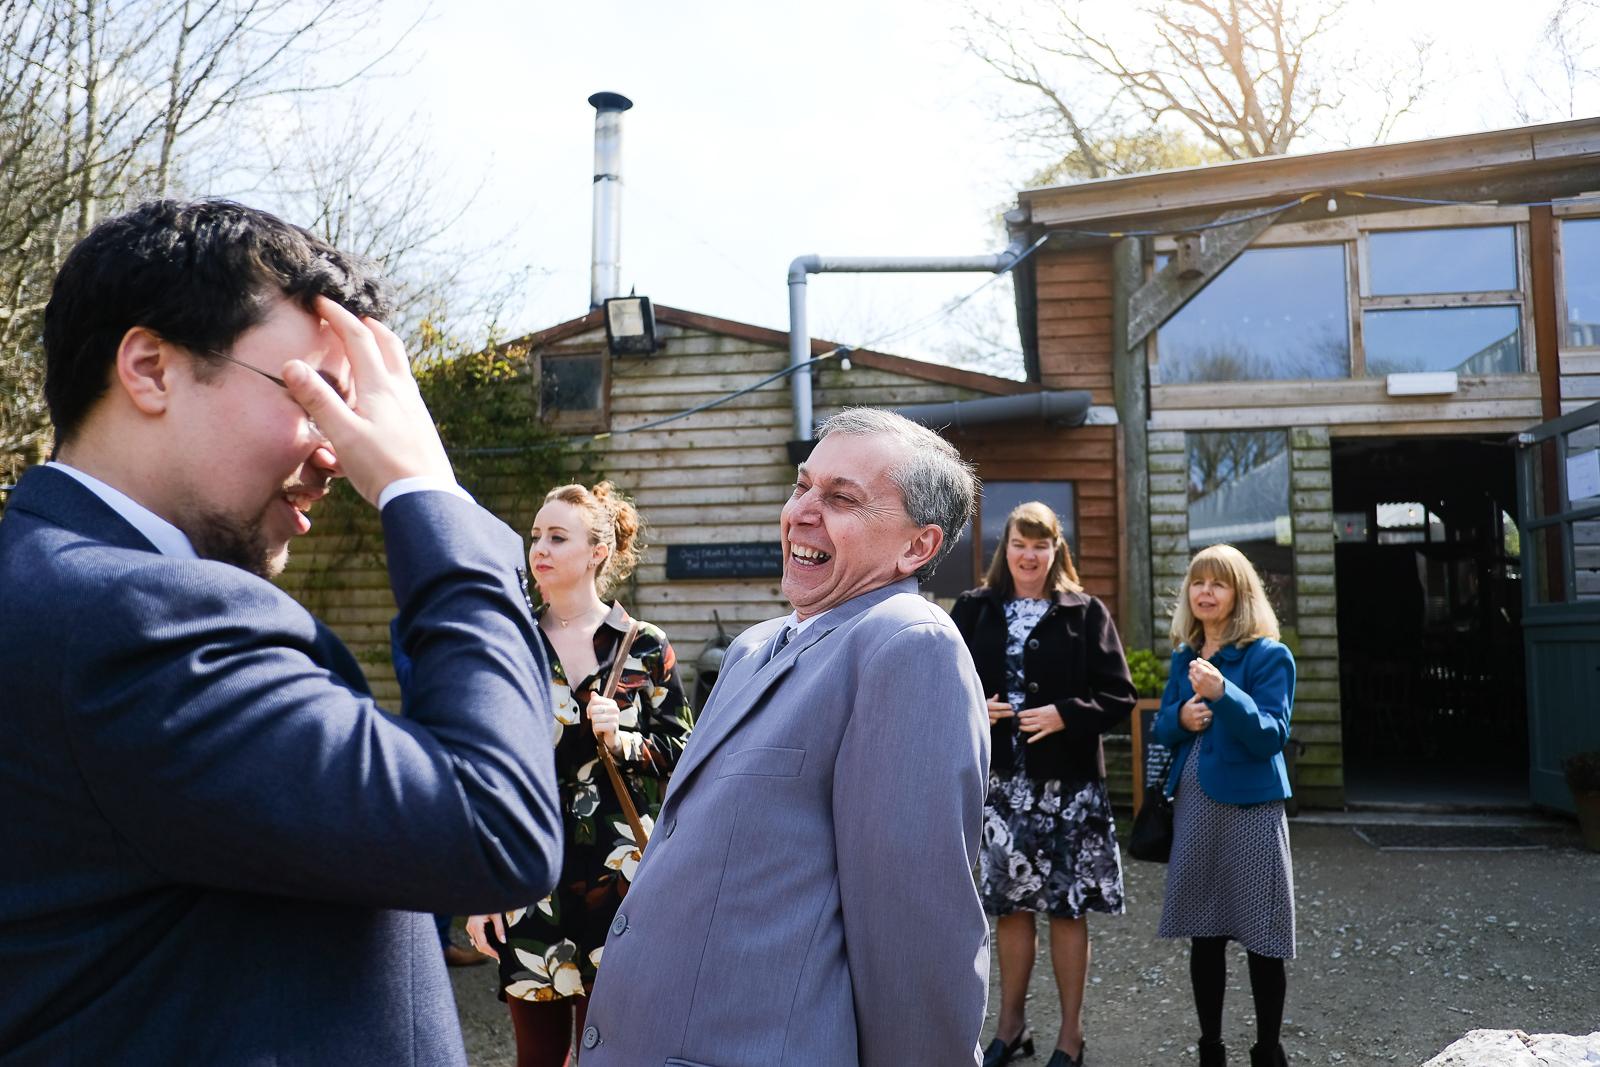 Retorrick Mill Newquay wedding 054.jpg